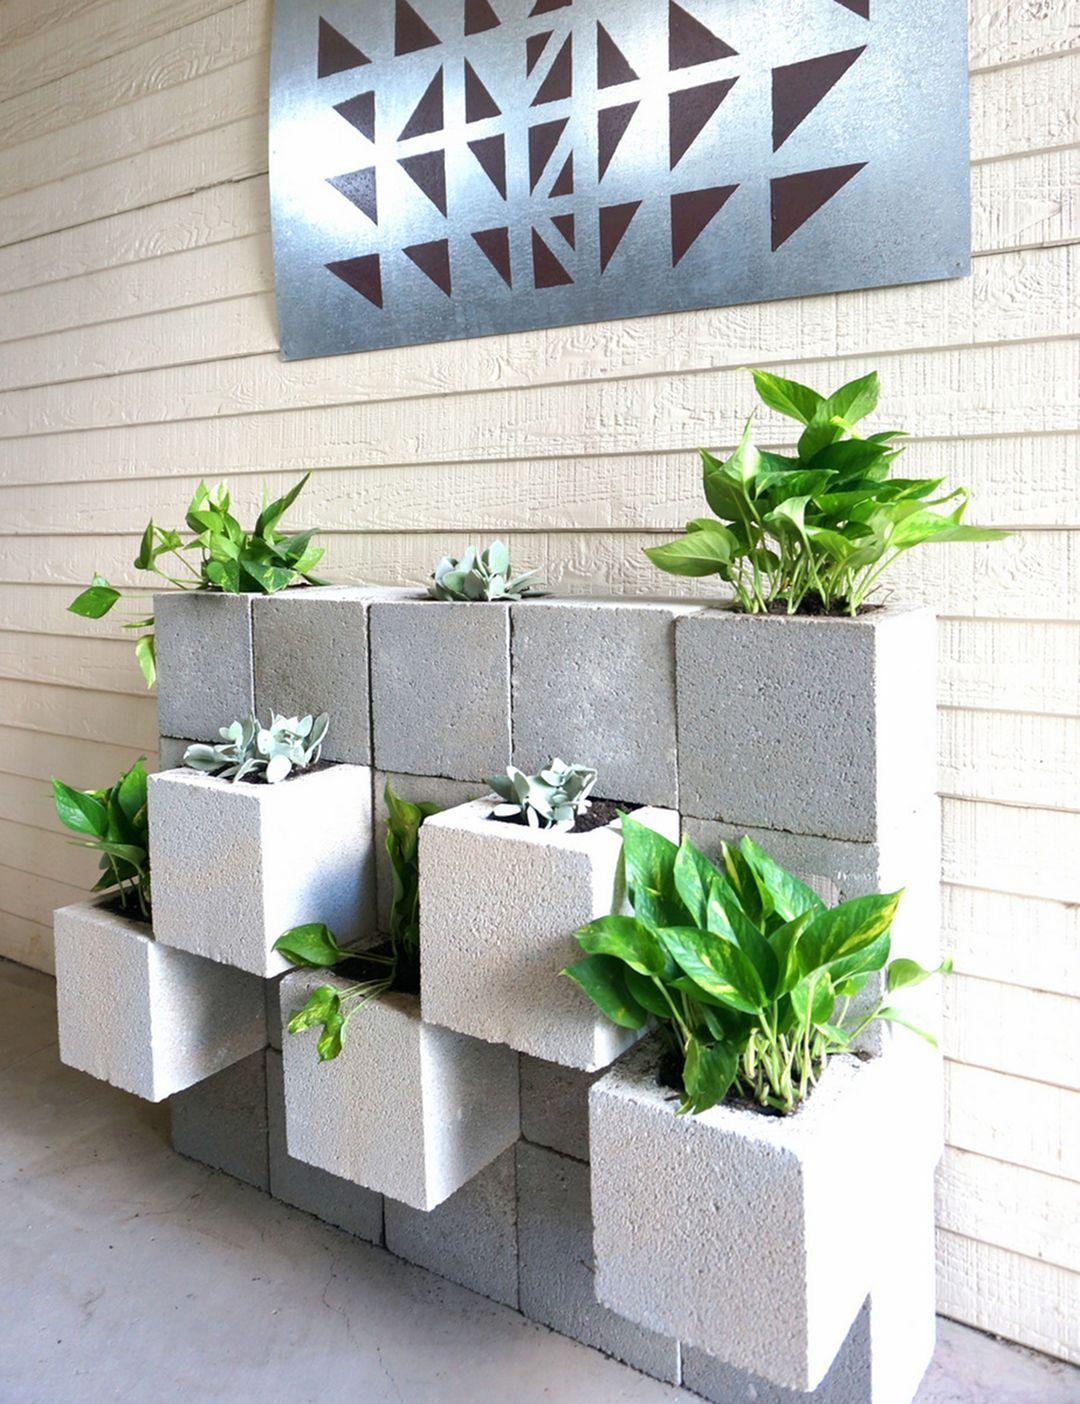 Decorative Cinder Blocks For Outdoor | Decorative cinder ... on Backyard Cinder Block Wall Ideas id=39997